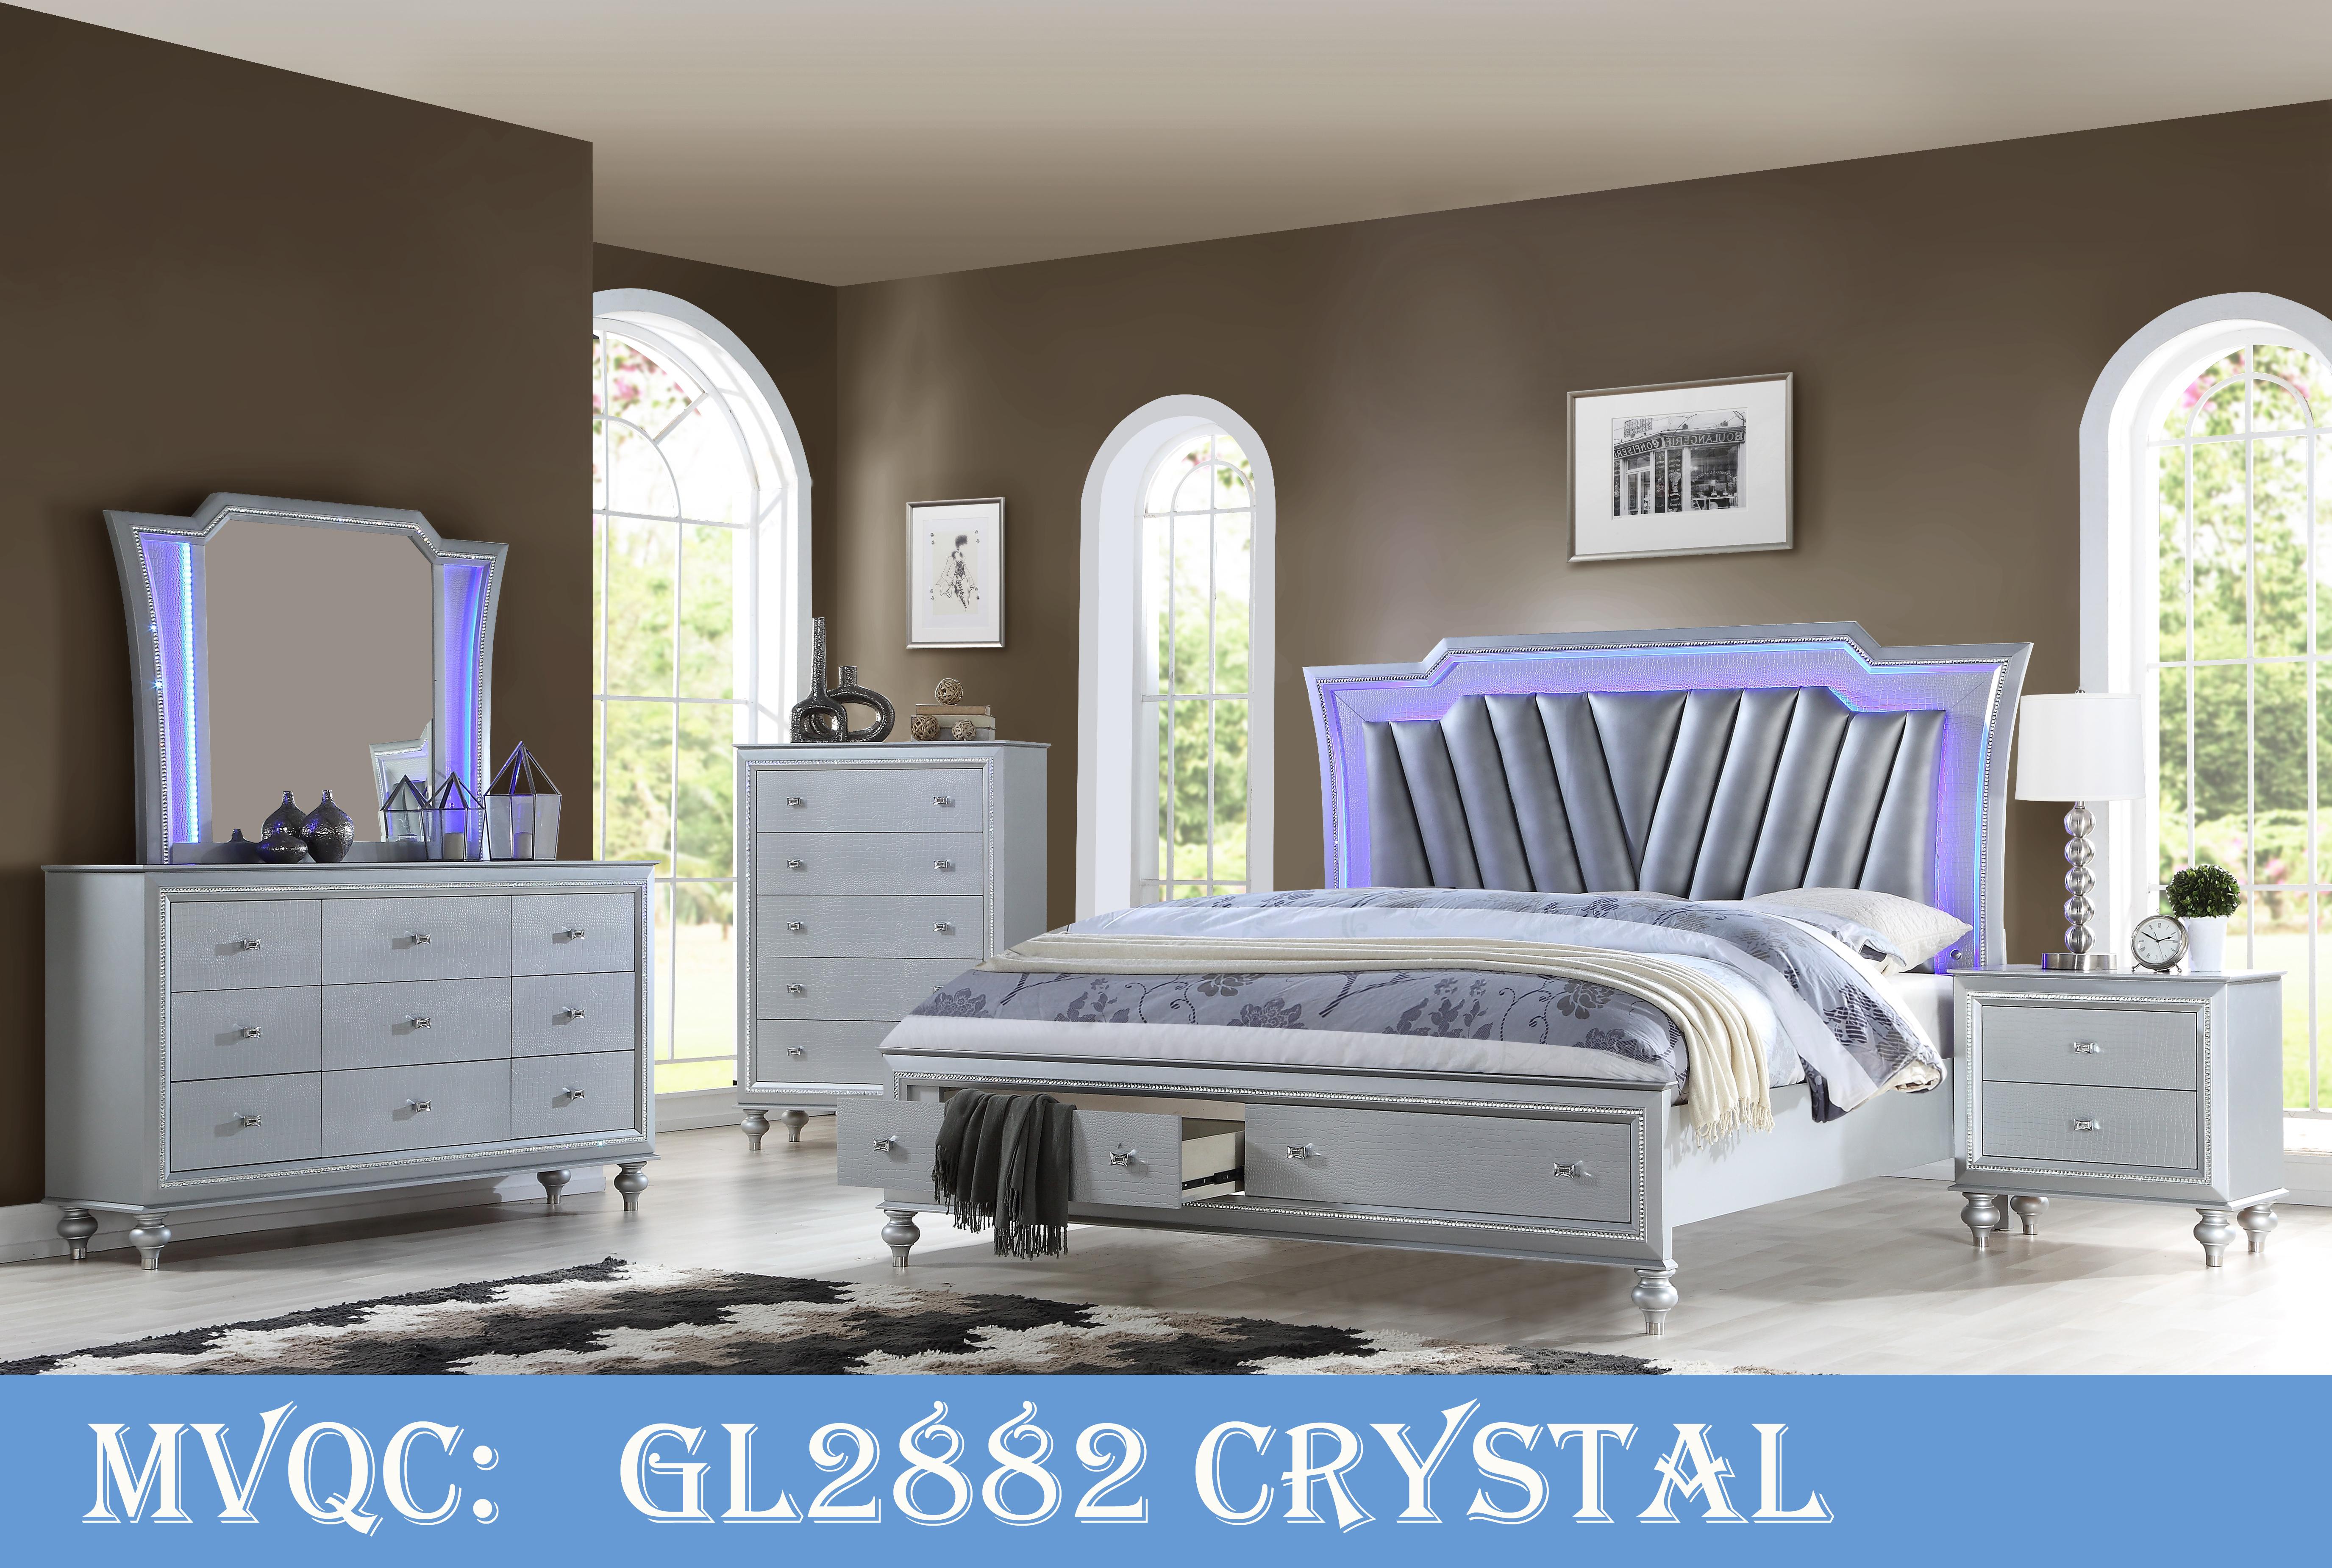 GL2882 CRYSTAL